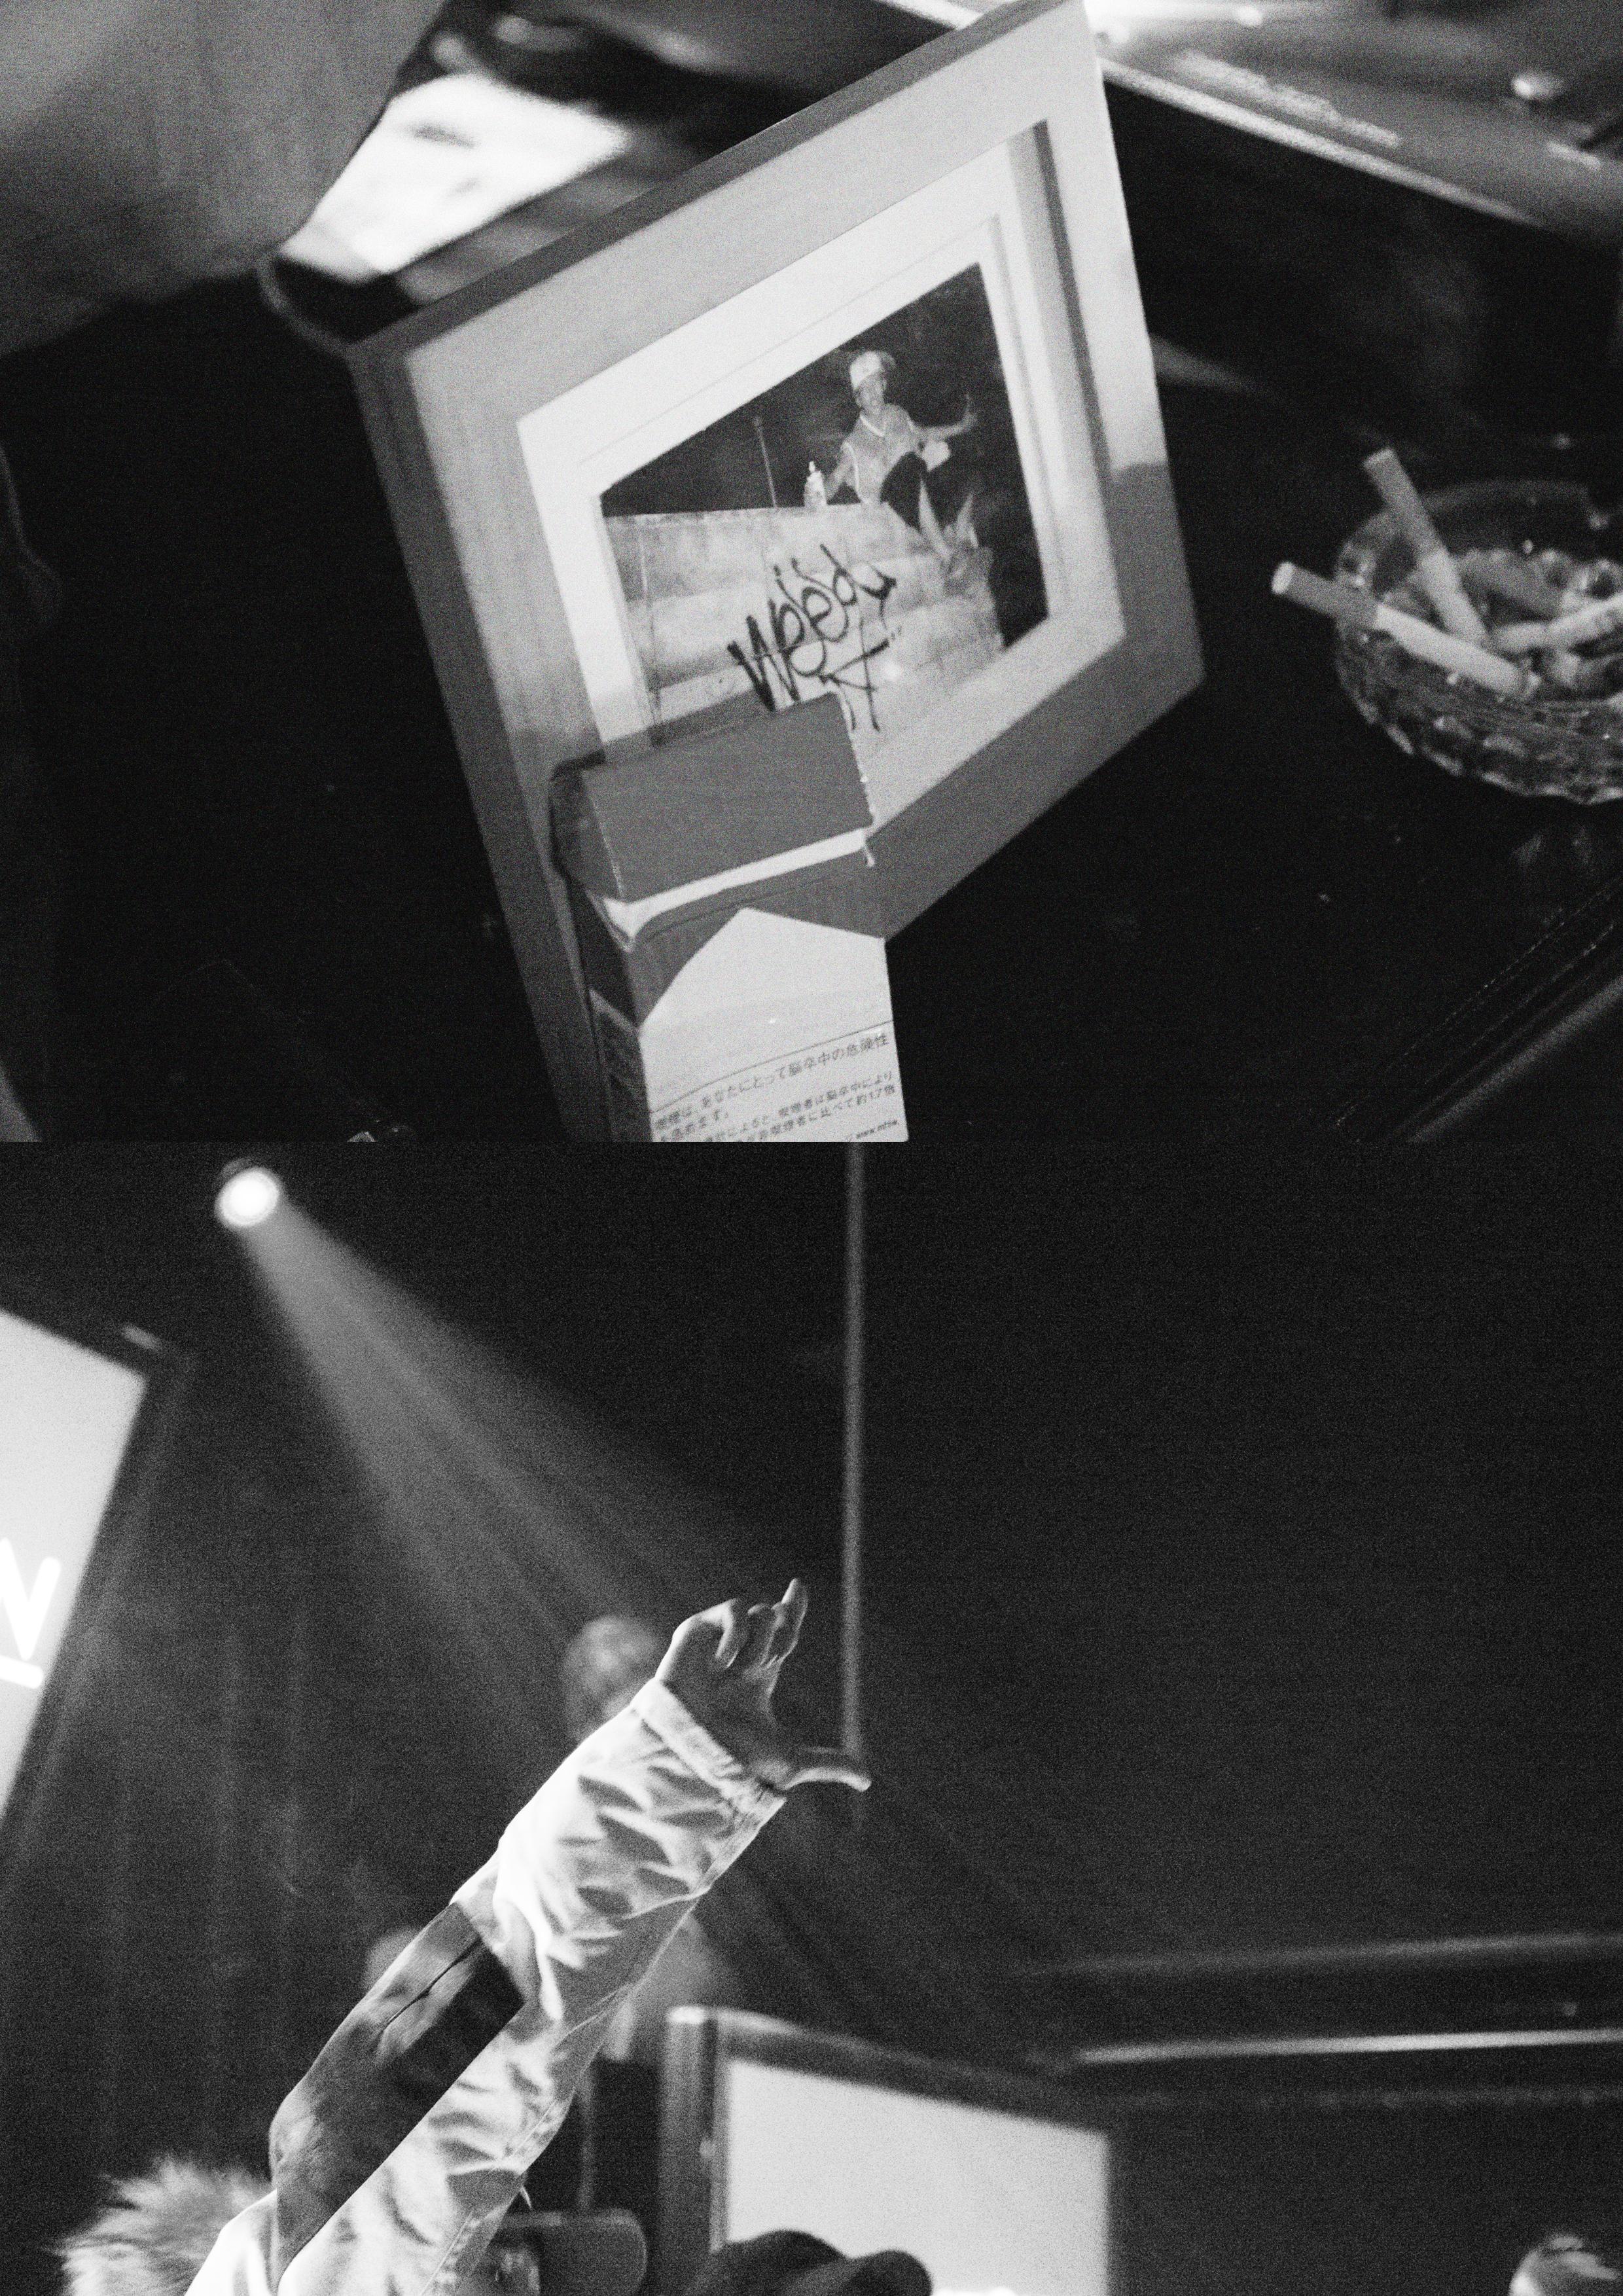 KANDYTOWN 5CITY TOUR_1.jpg